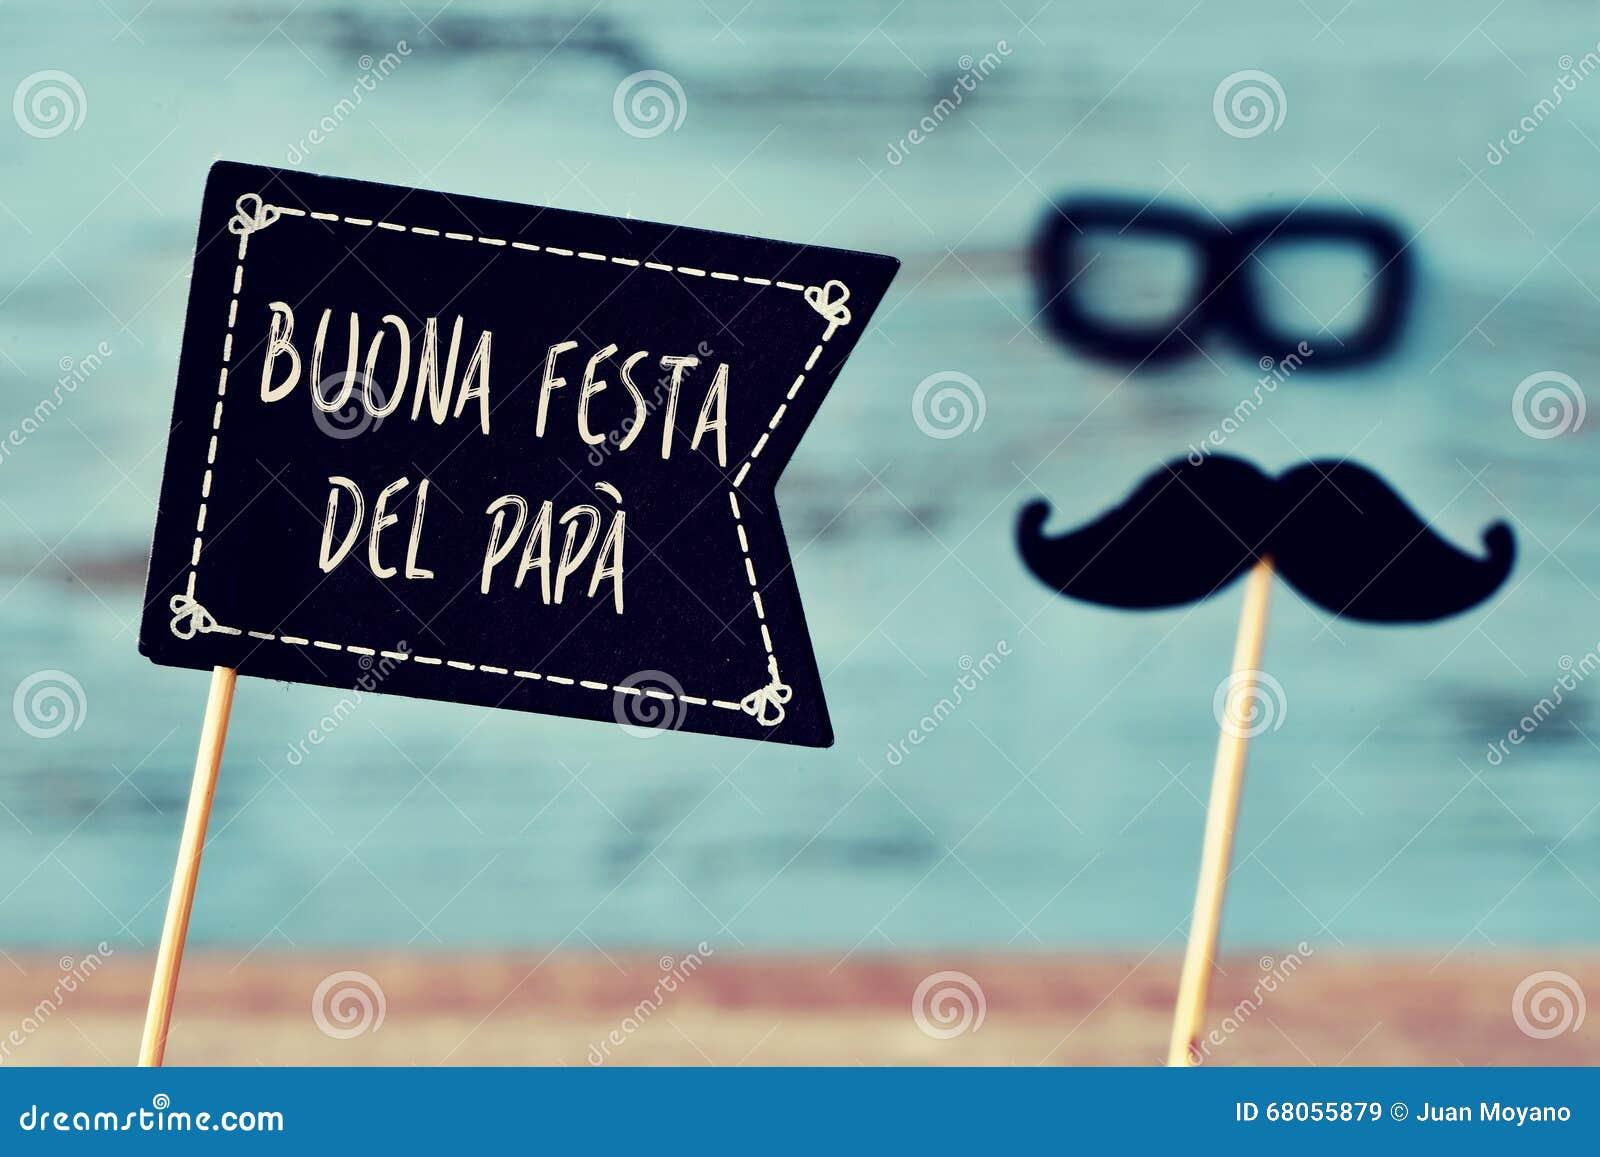 Text Buona Festa Del Papa Happy Fathers Day In Italian Stock Image